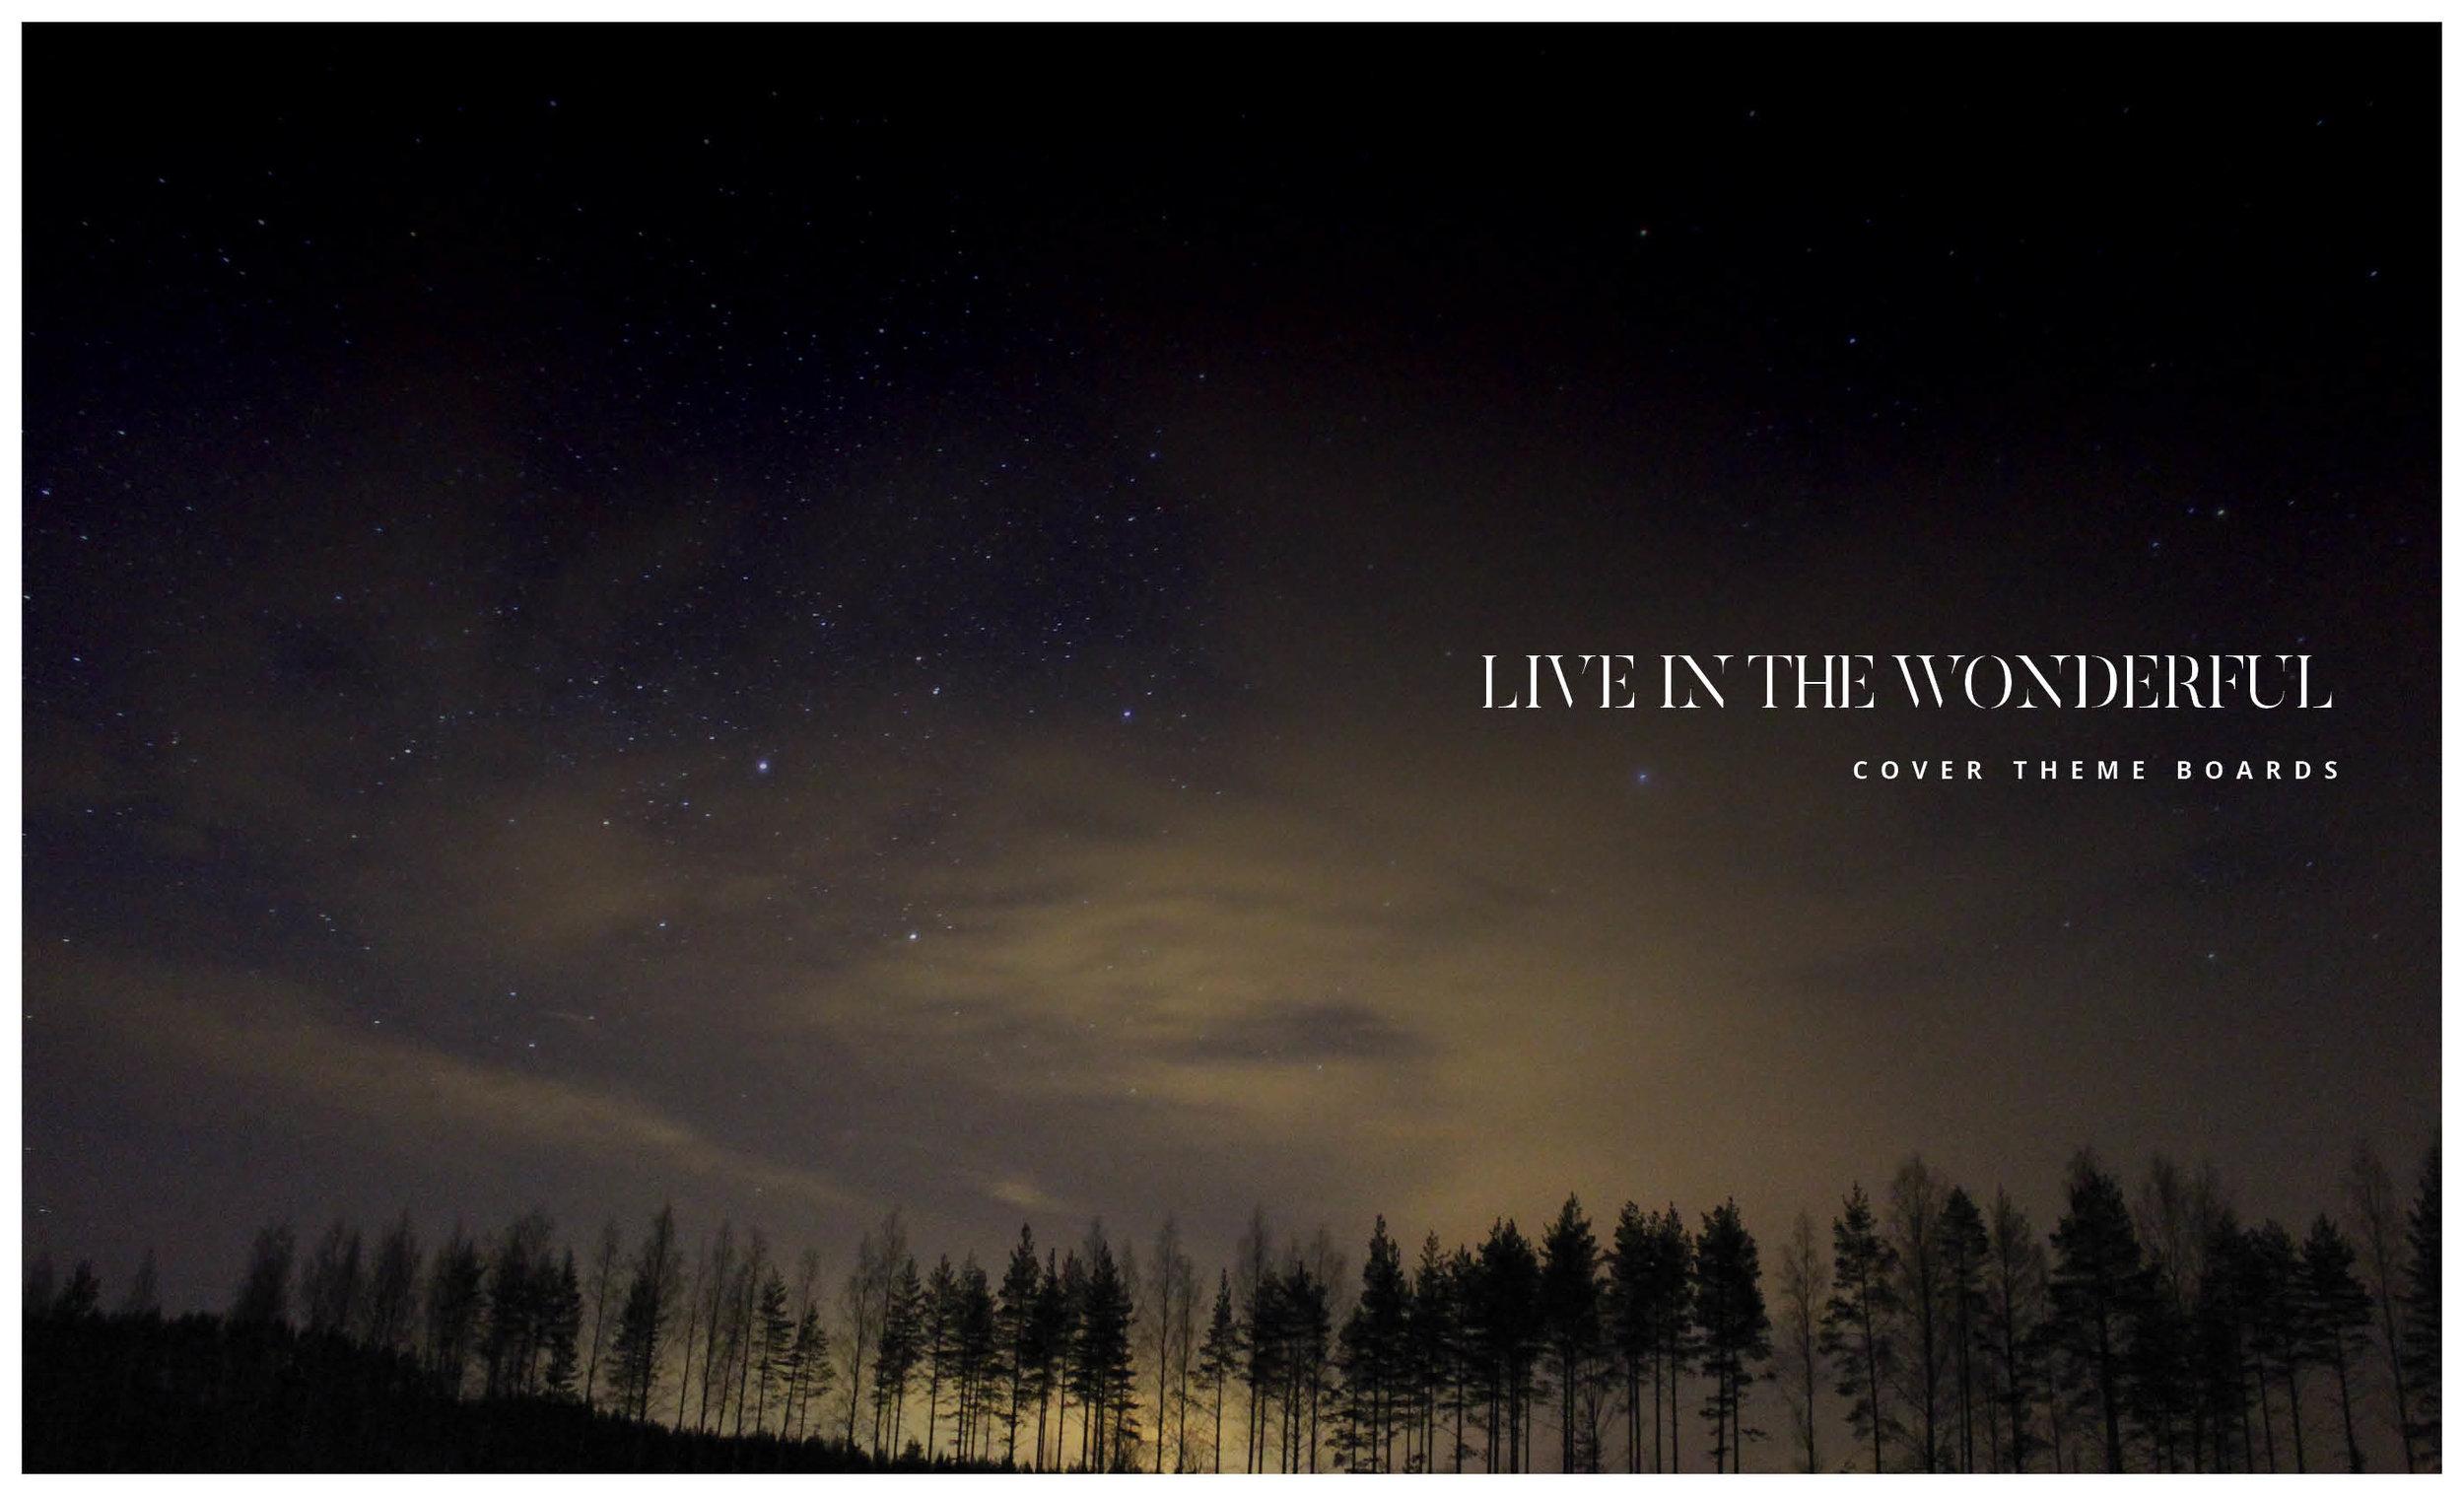 lwm-liveinthewonderful-themeboard-4-1.jpg